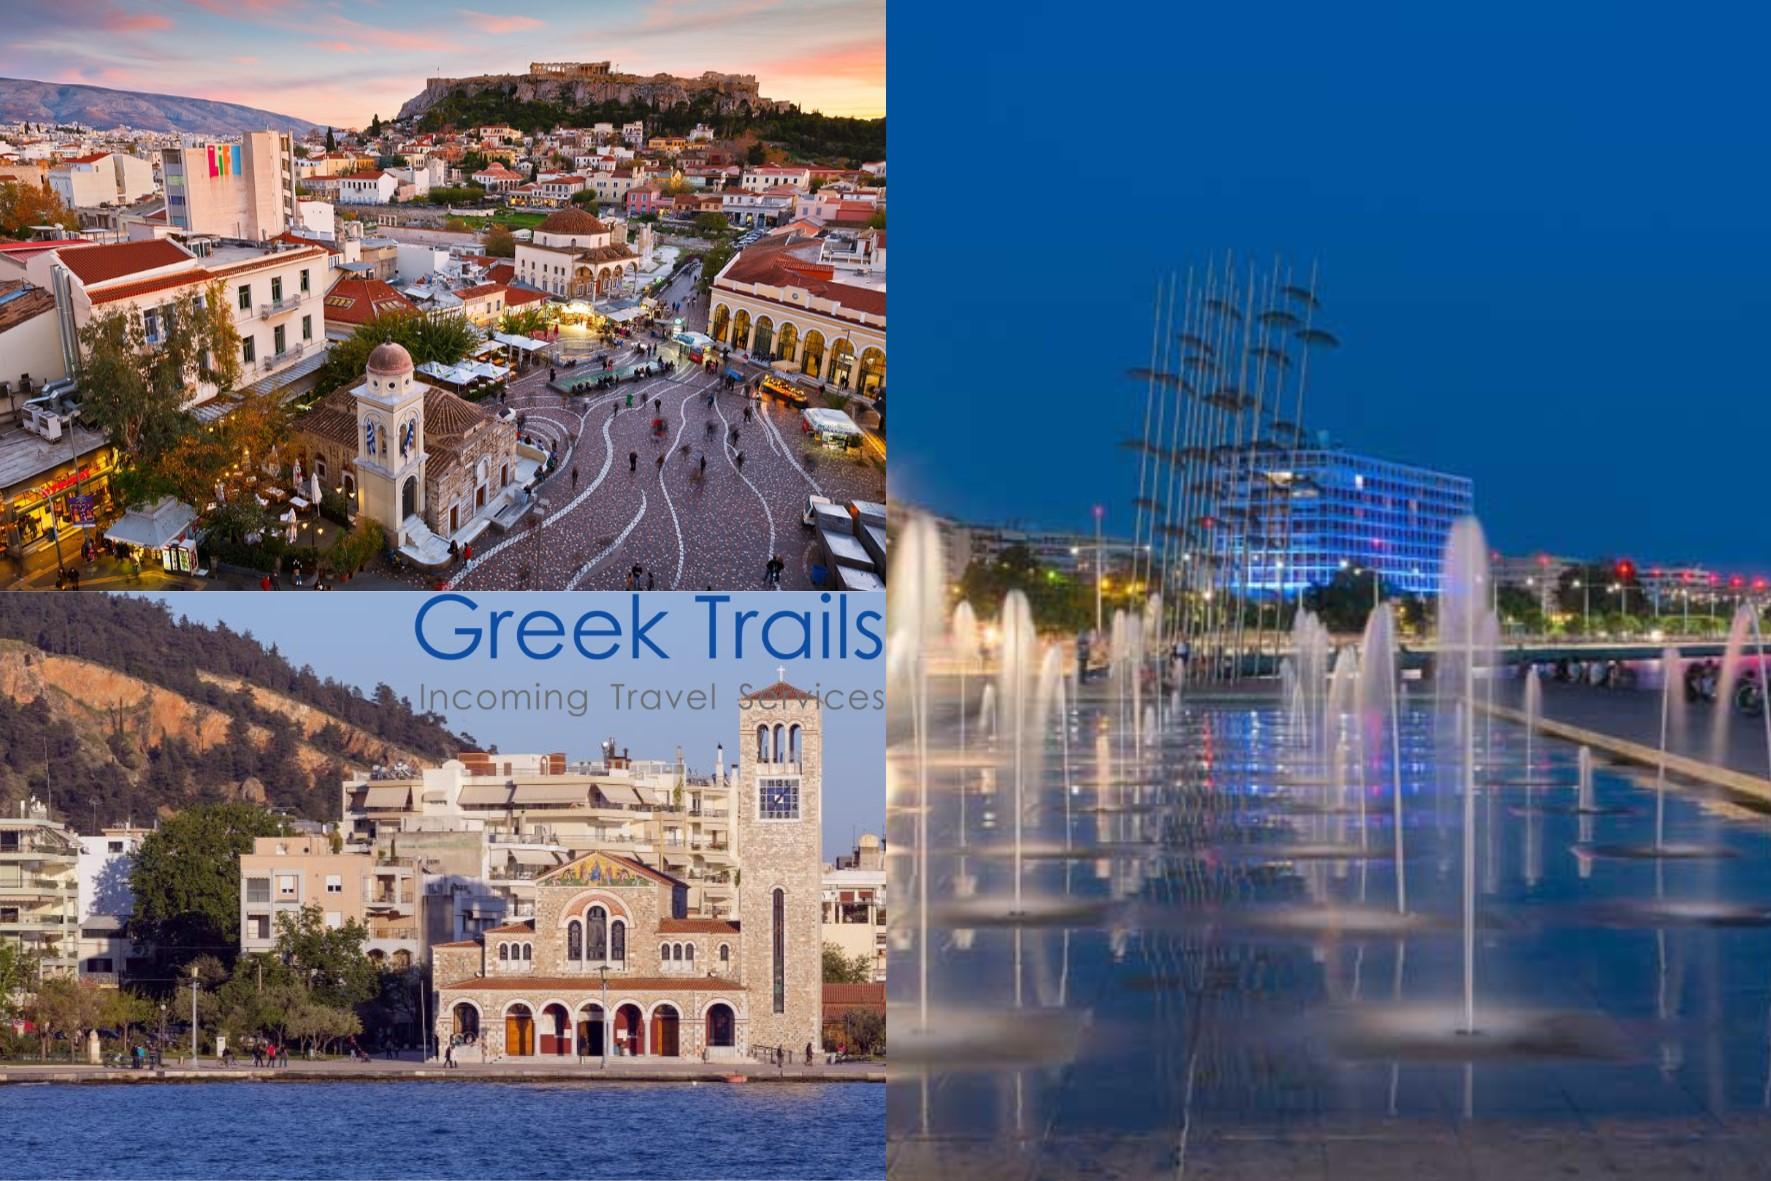 Athens – Volos / Pelion – Thessaloniki